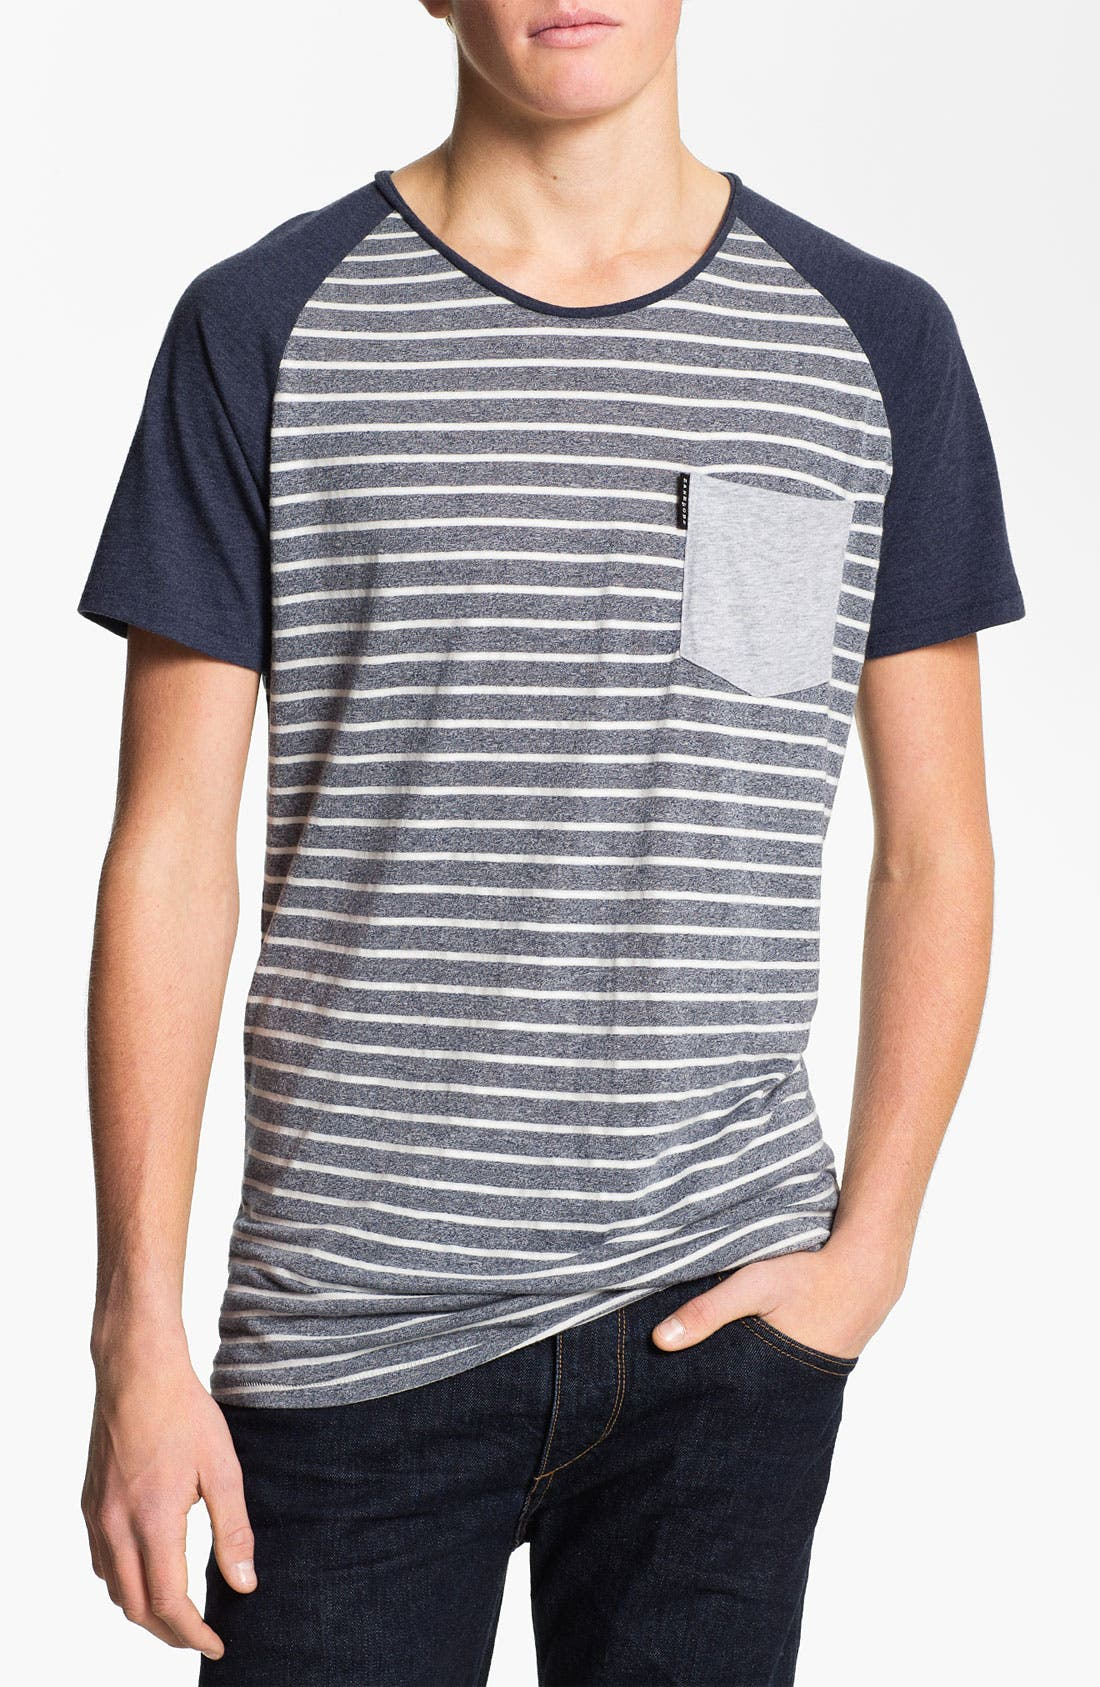 Alternate Image 1 Selected - ZANEROBE 'Duke' Stripe Scoop Neck T-Shirt